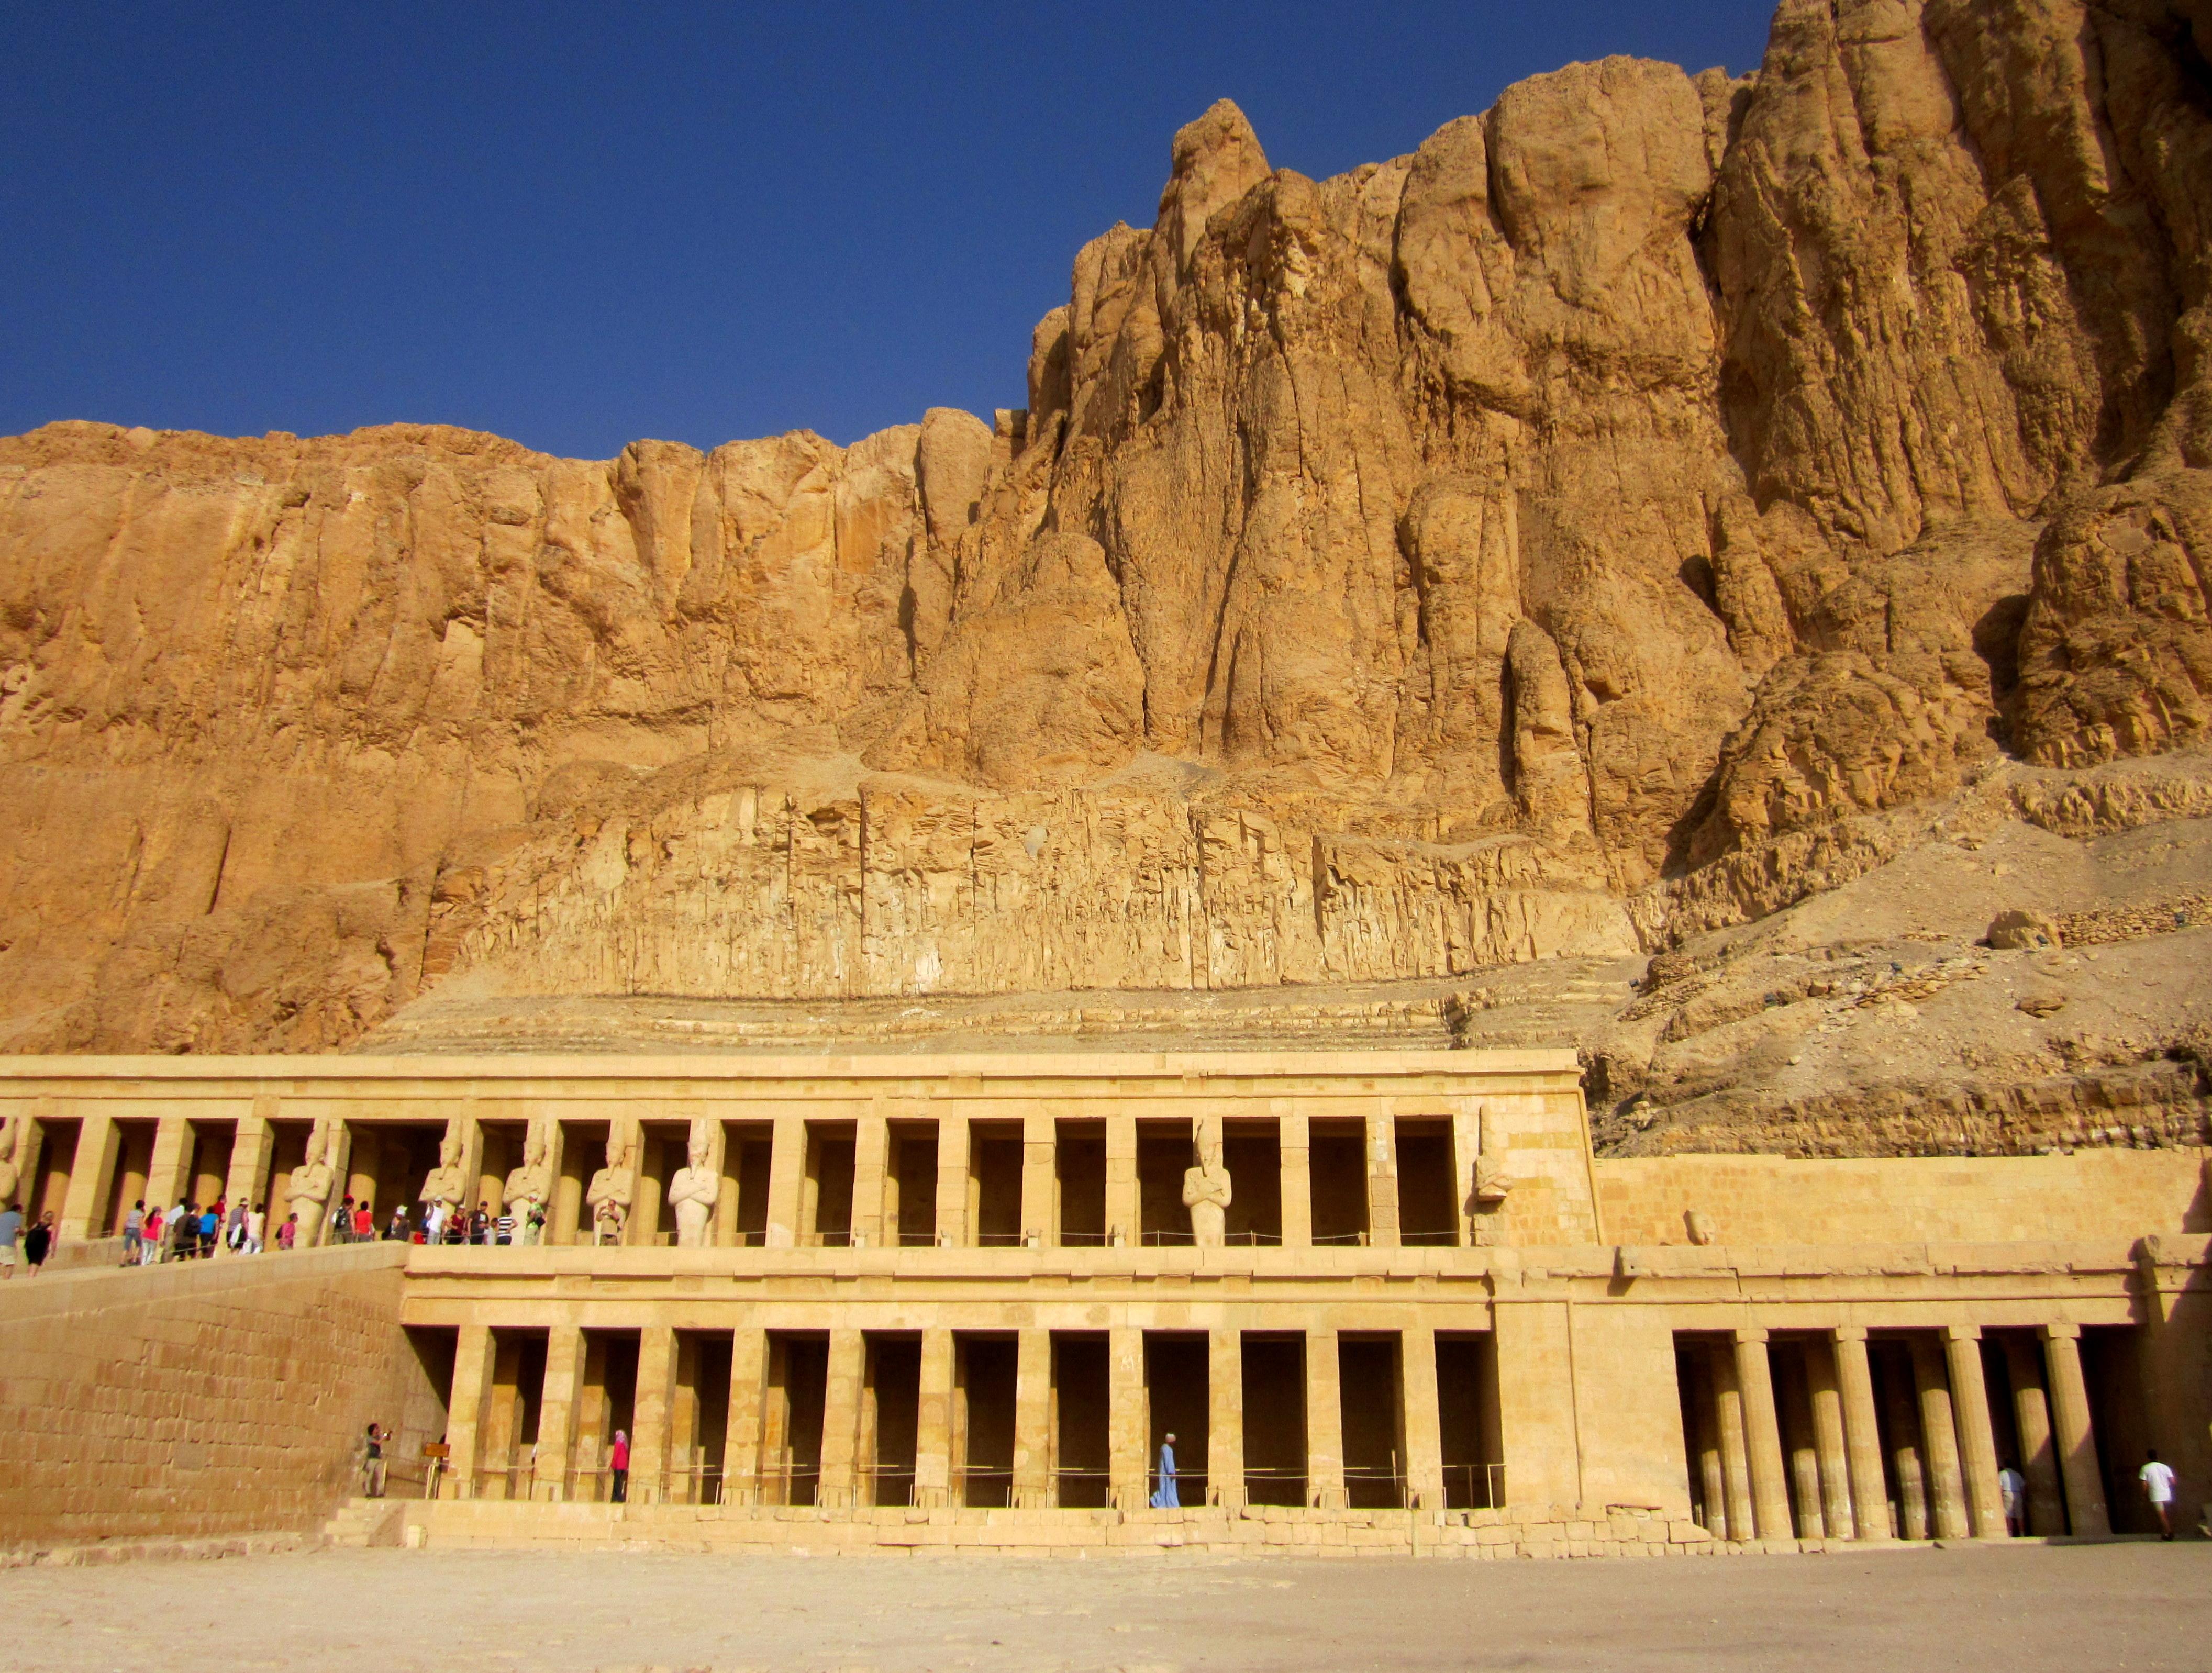 #egypt #egypttourism #valleyofkings#luxor 3luxortourism #luxorwestbank #hatshepsutmortuarytemple